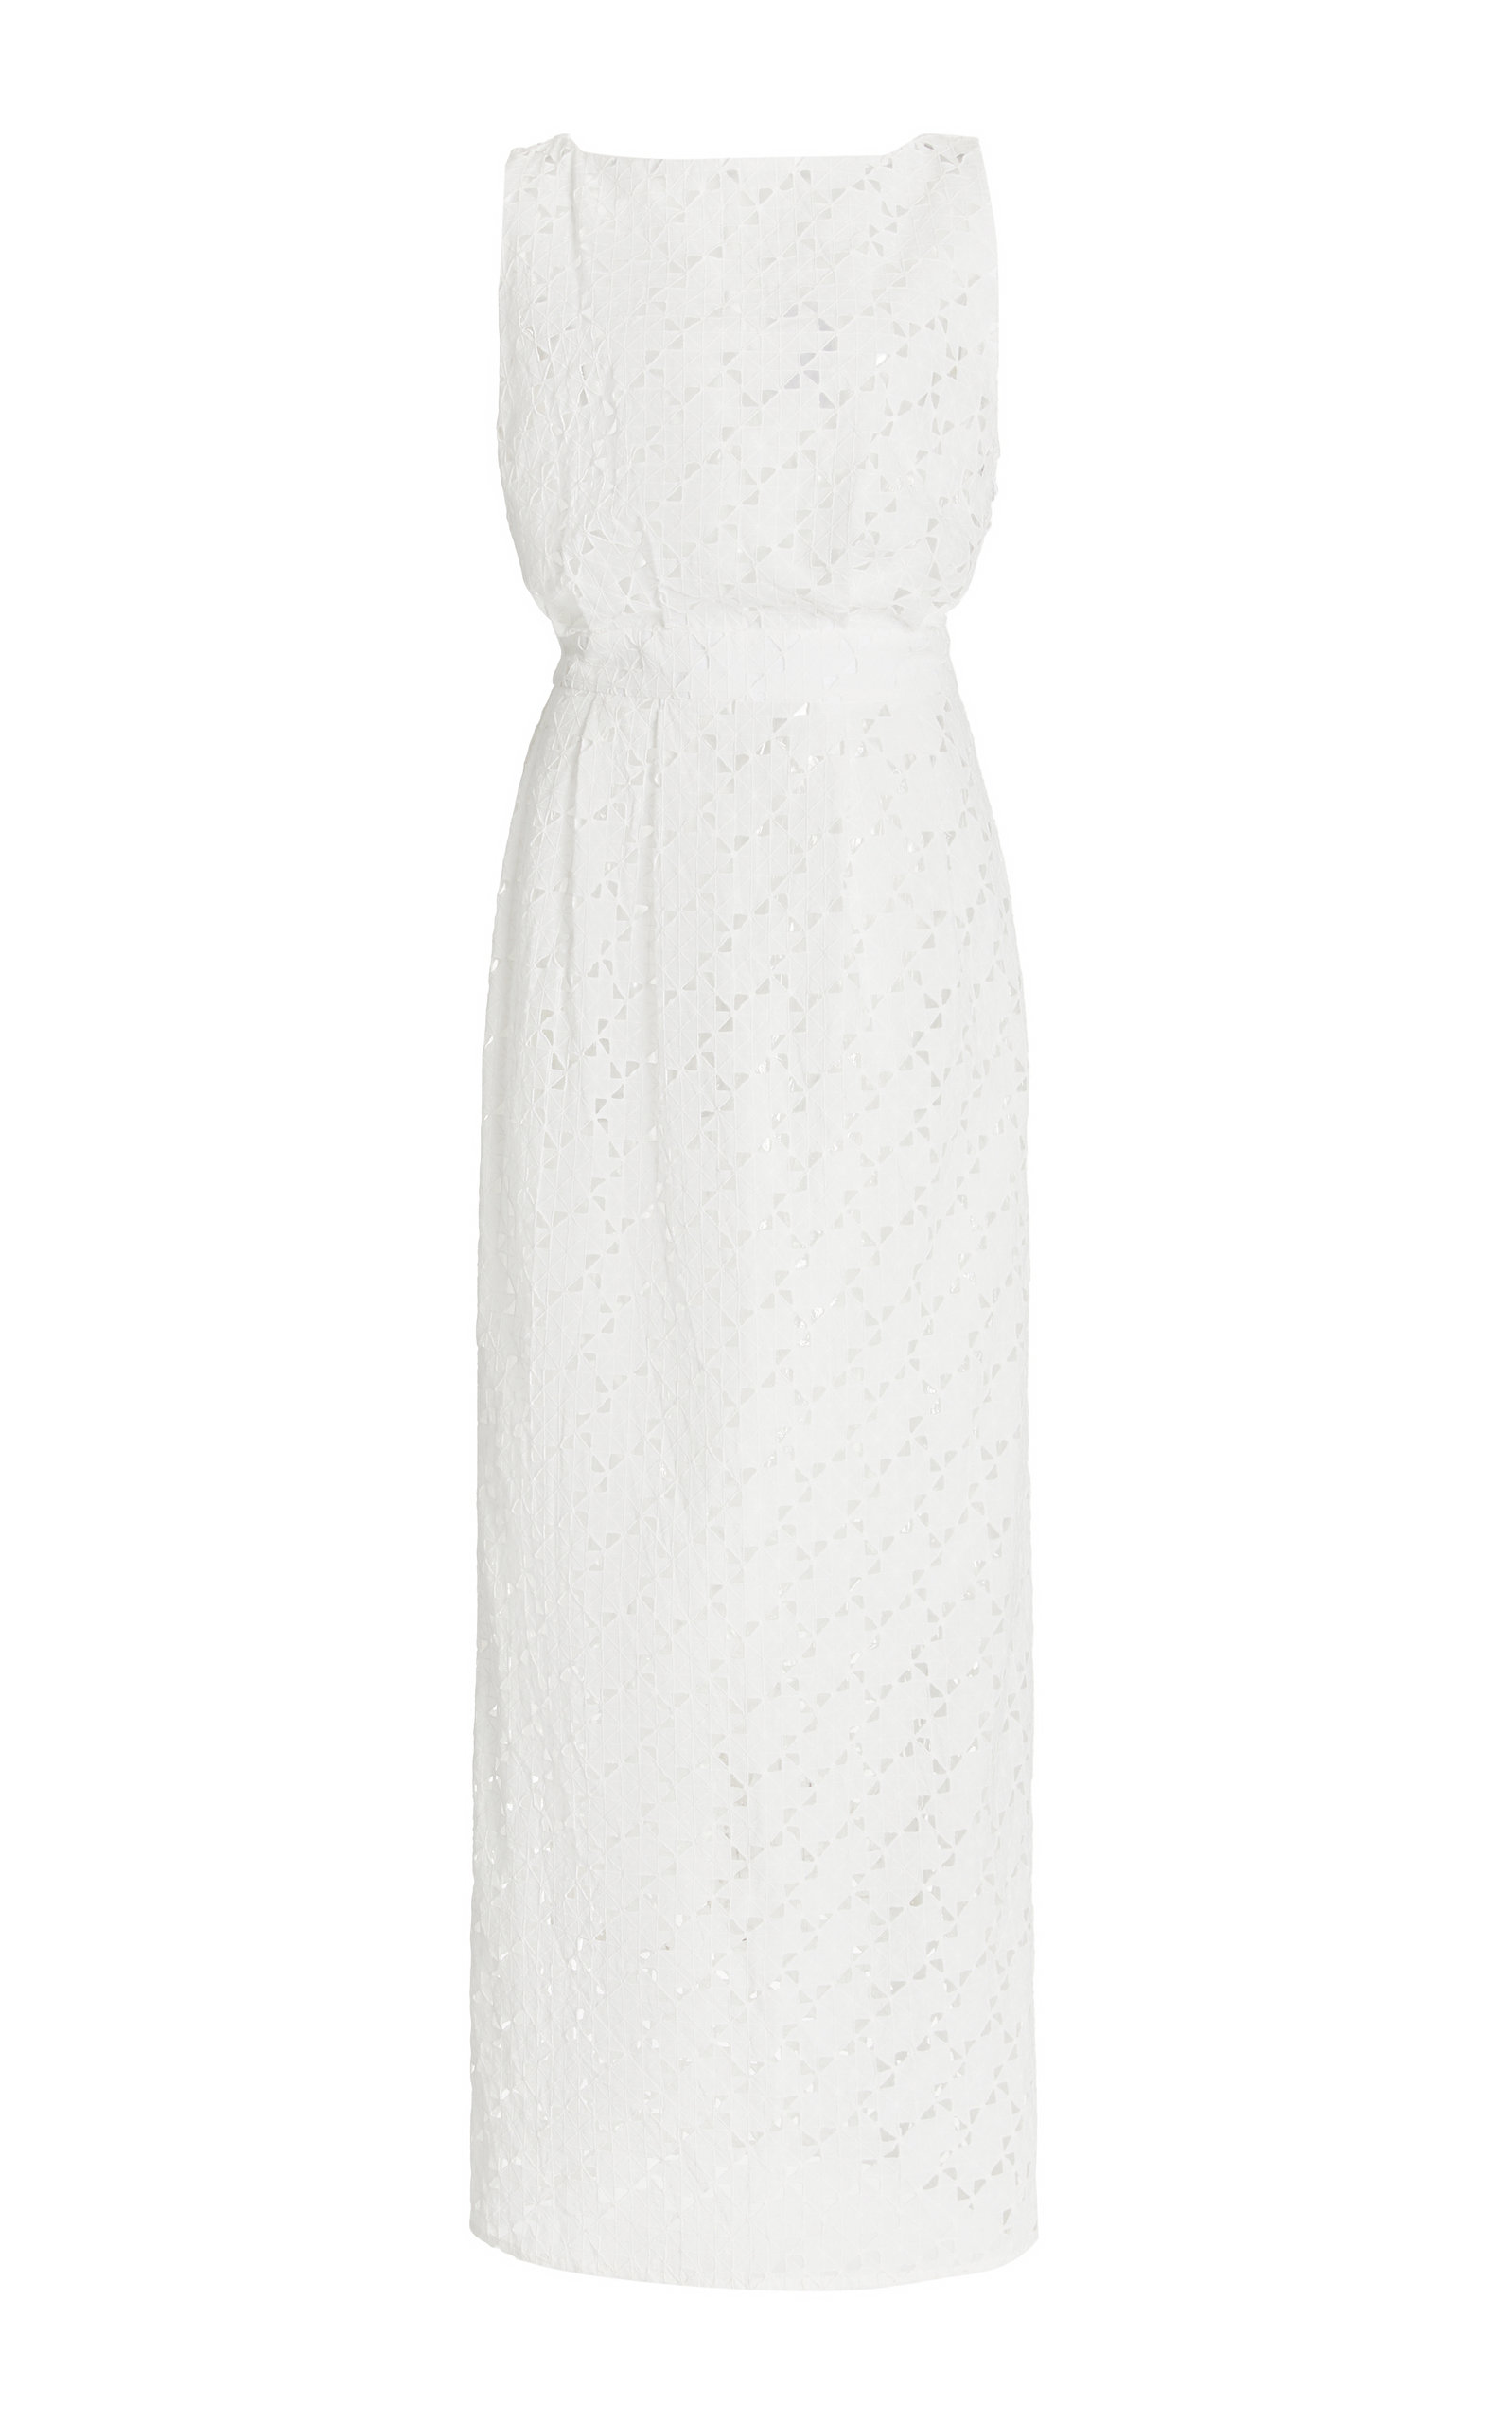 Women's Eyelet Cotton Midi Dress